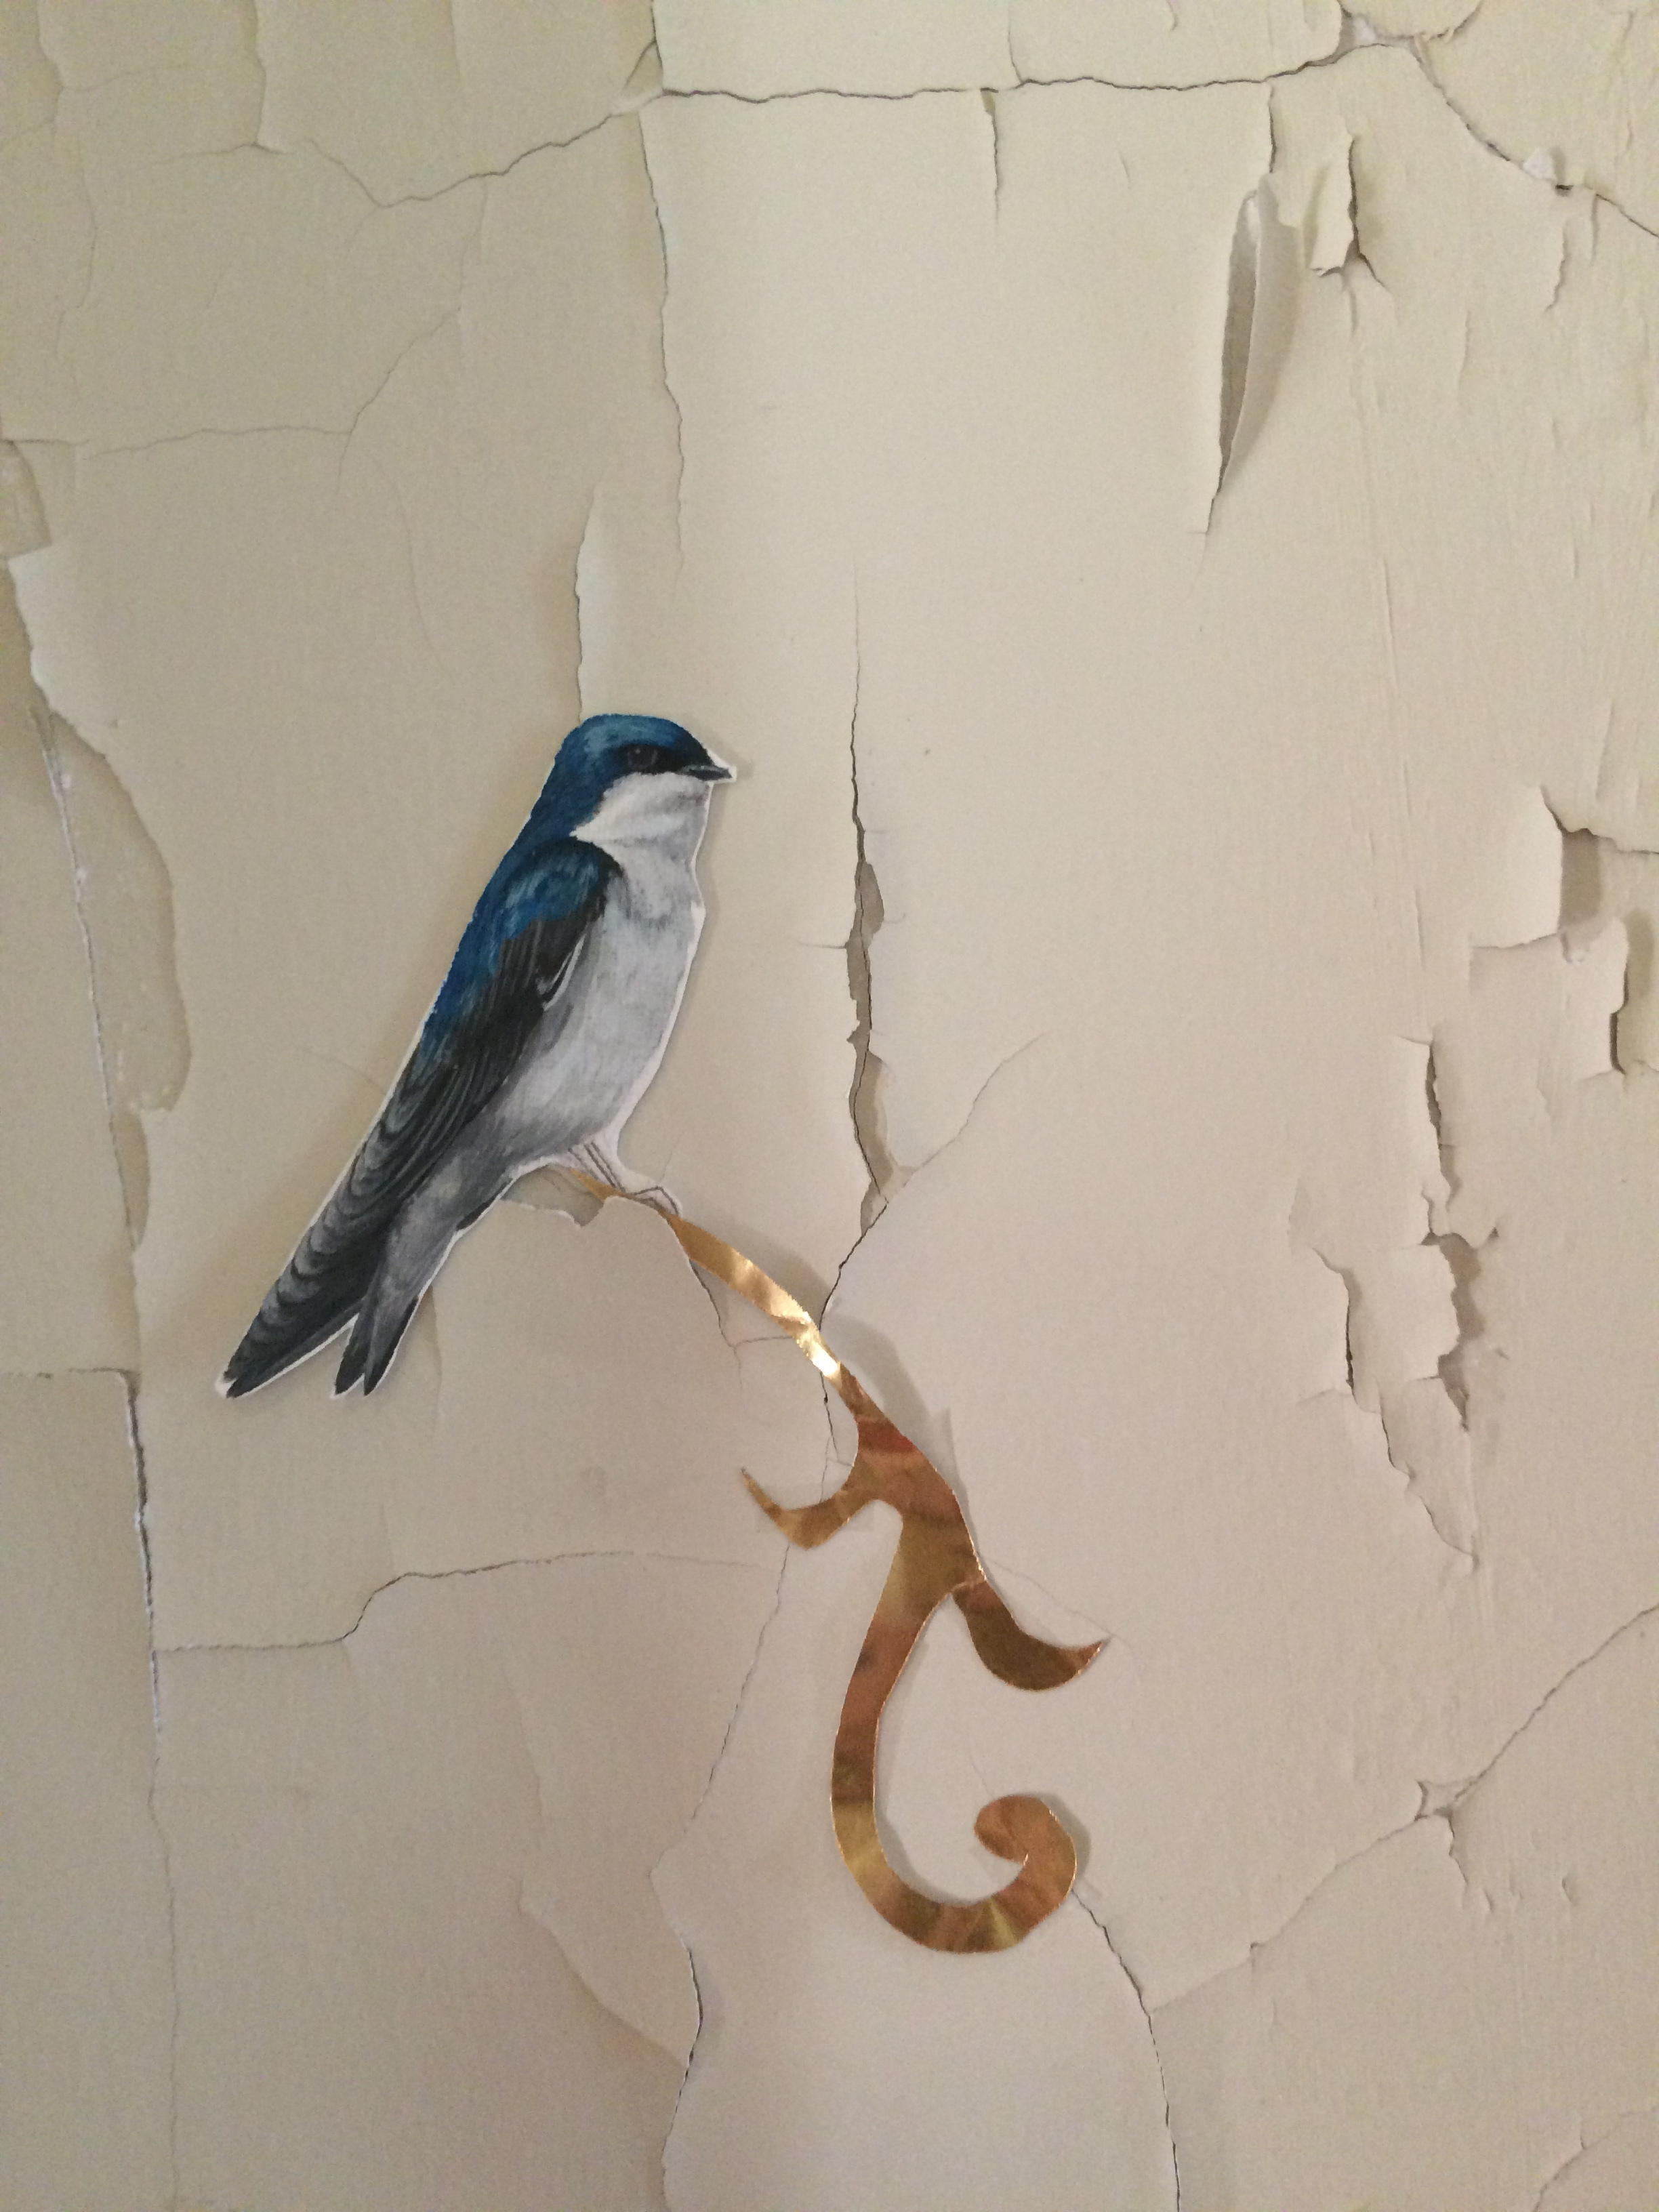 Audobon close up bird.JPG